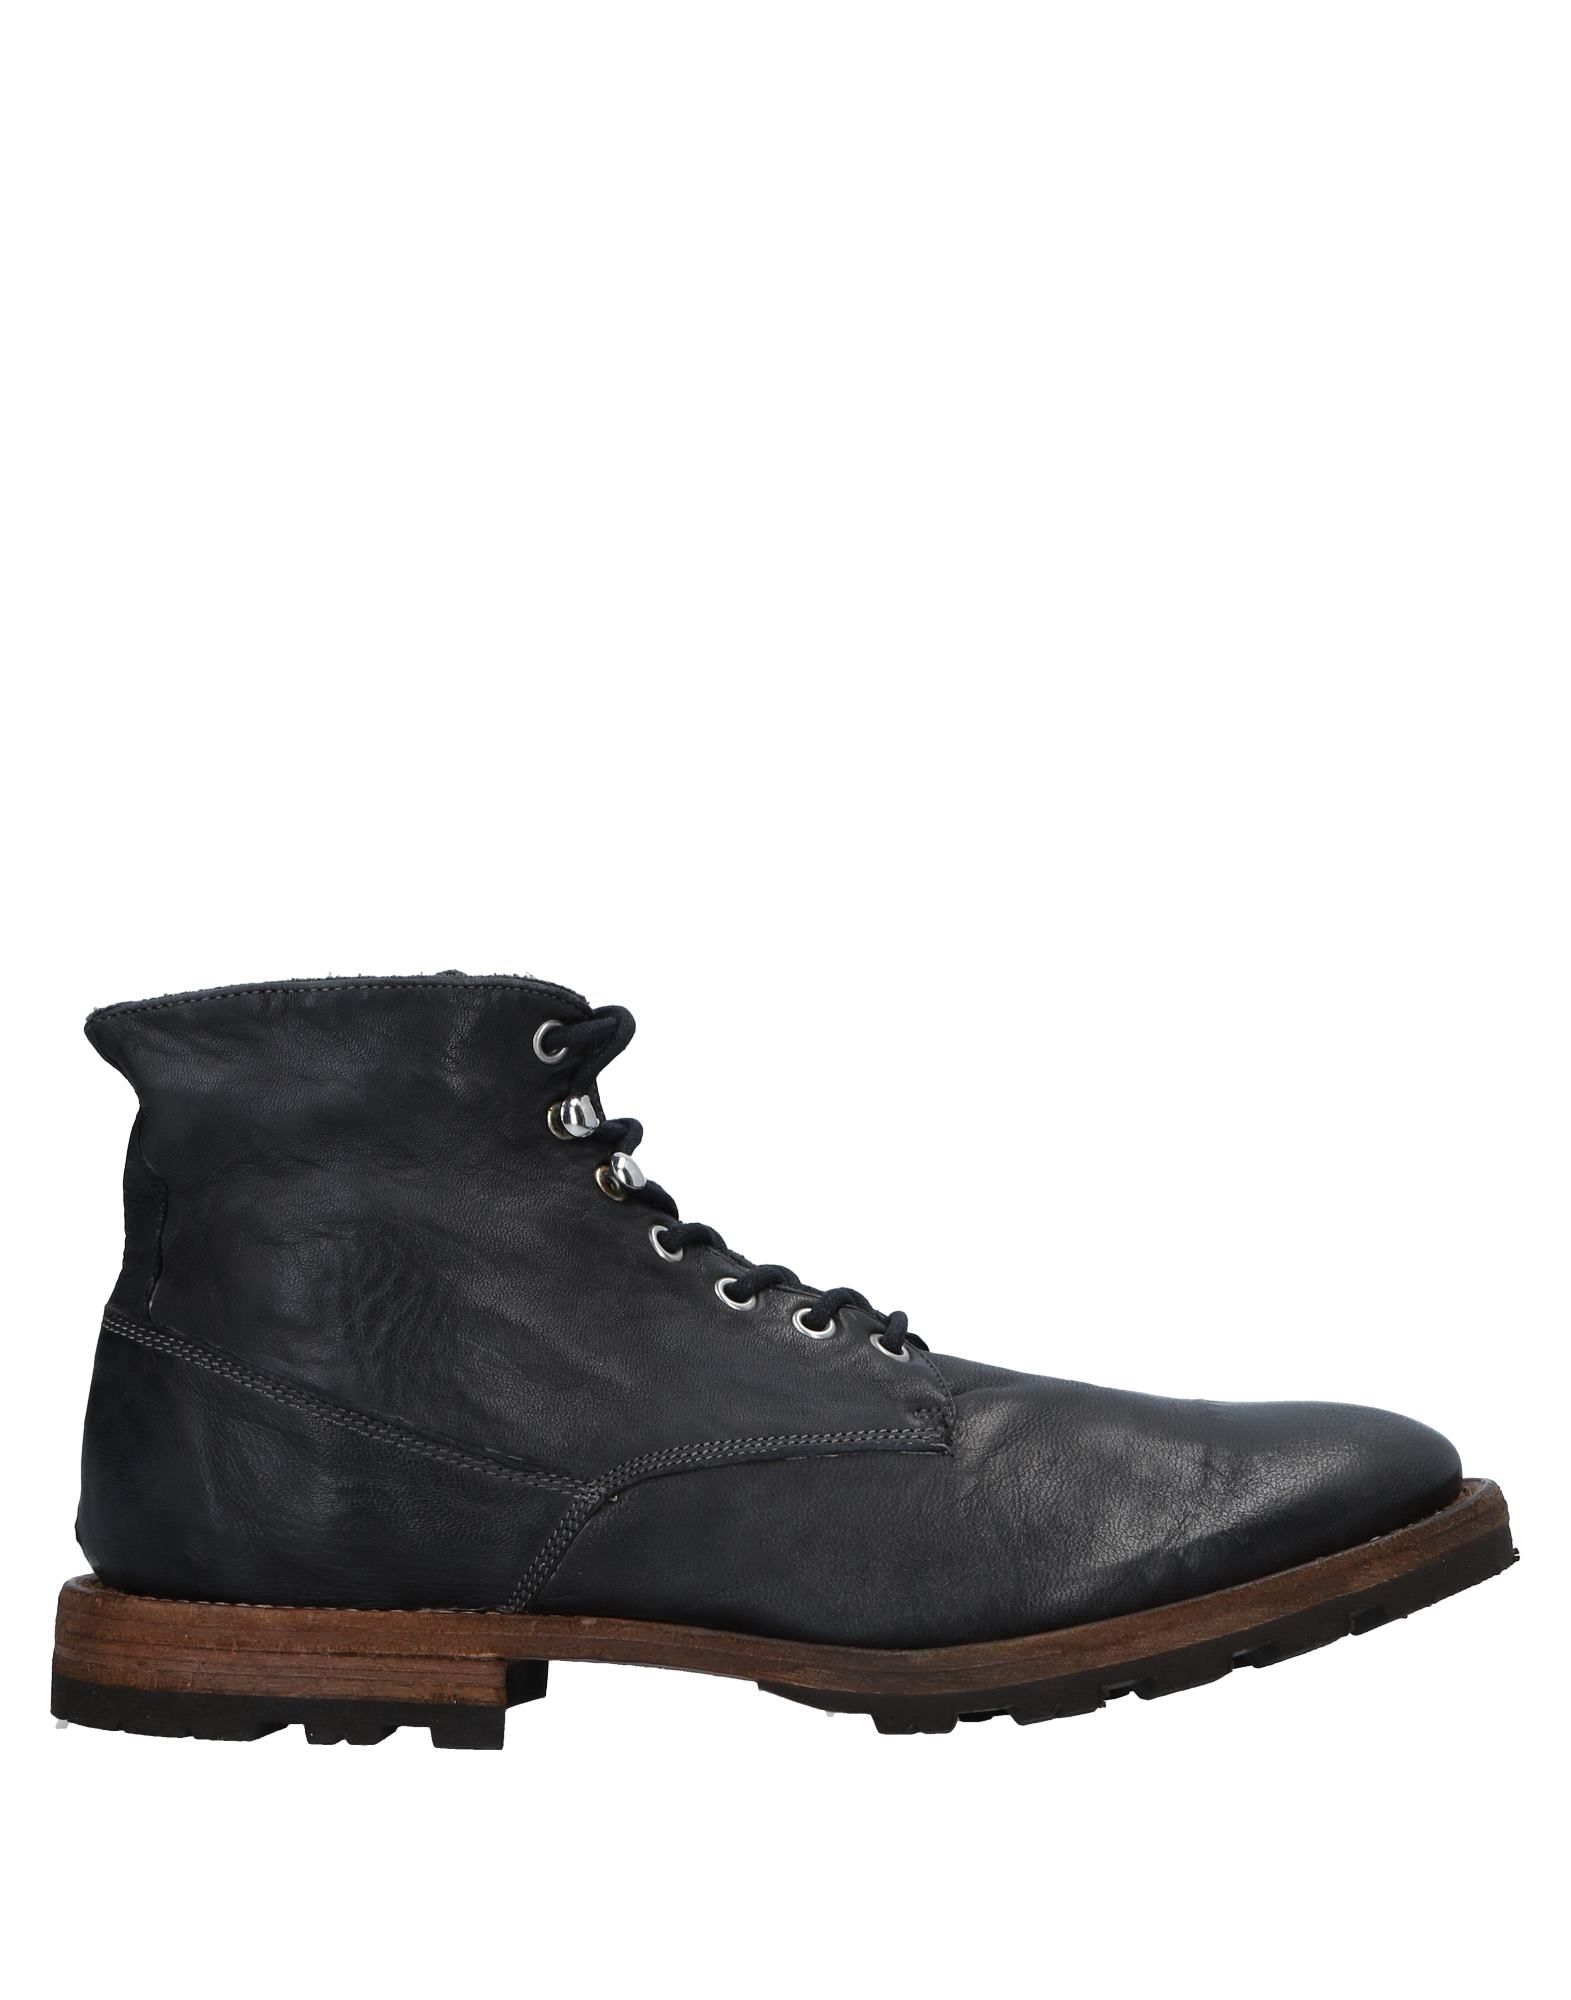 Andrea Ventura Firenze Stiefelette Herren  11531411AO Gute Qualität beliebte Schuhe